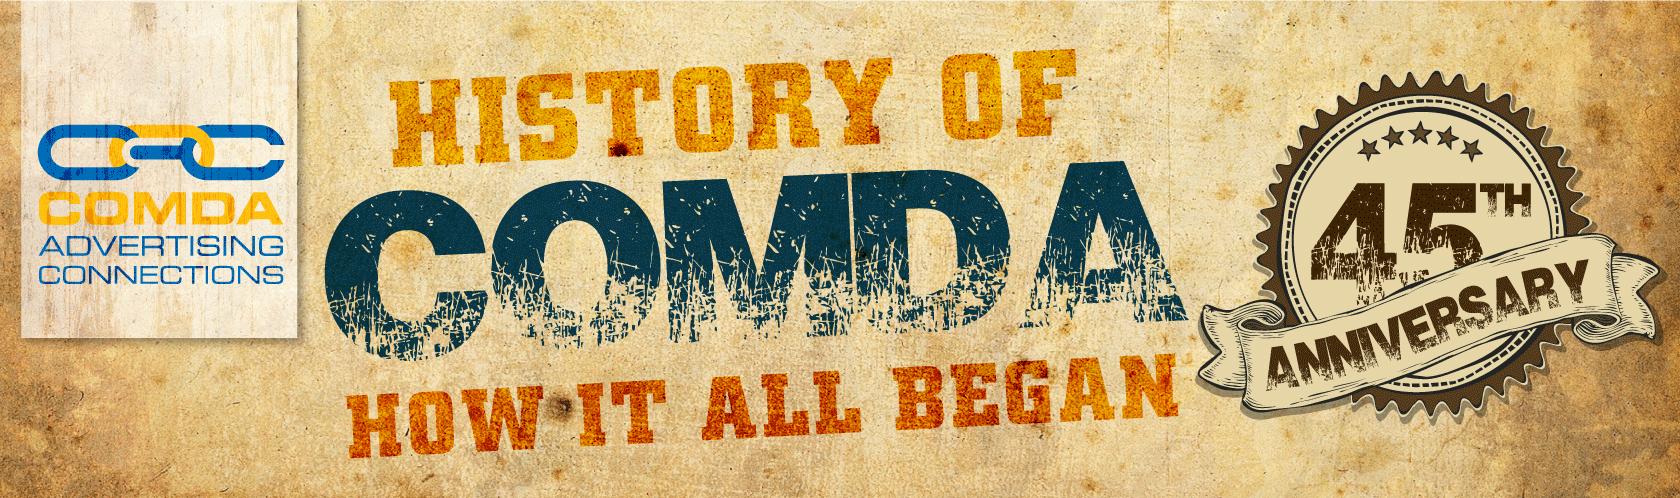 History of COMDA: How it All Began!